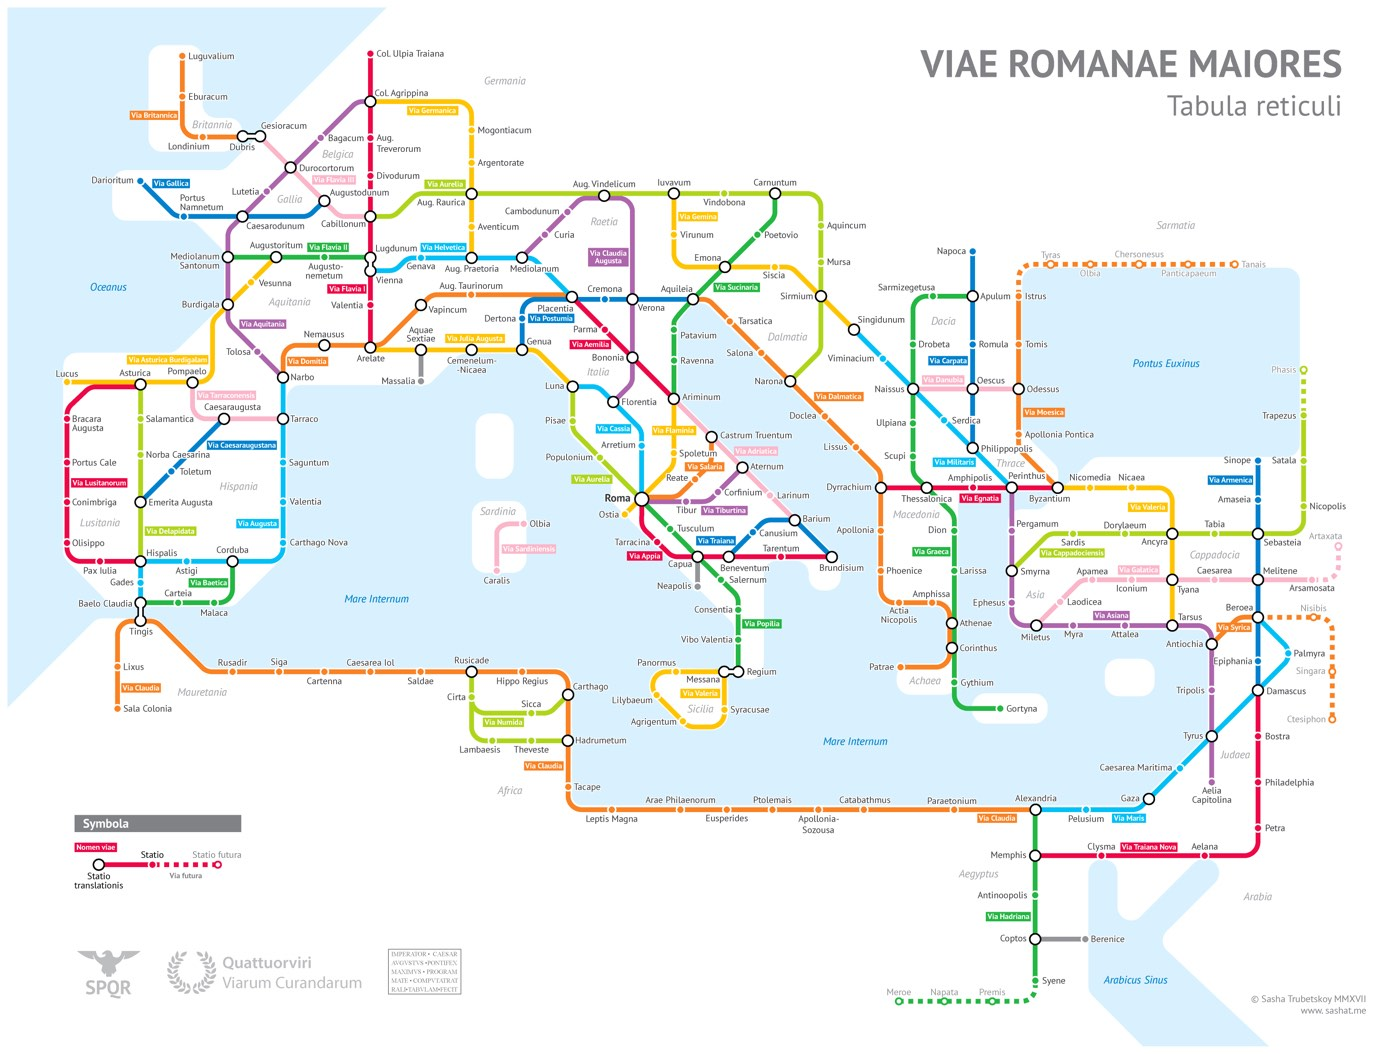 A subway-style map of Roman Empire roads circa 125 A.D.